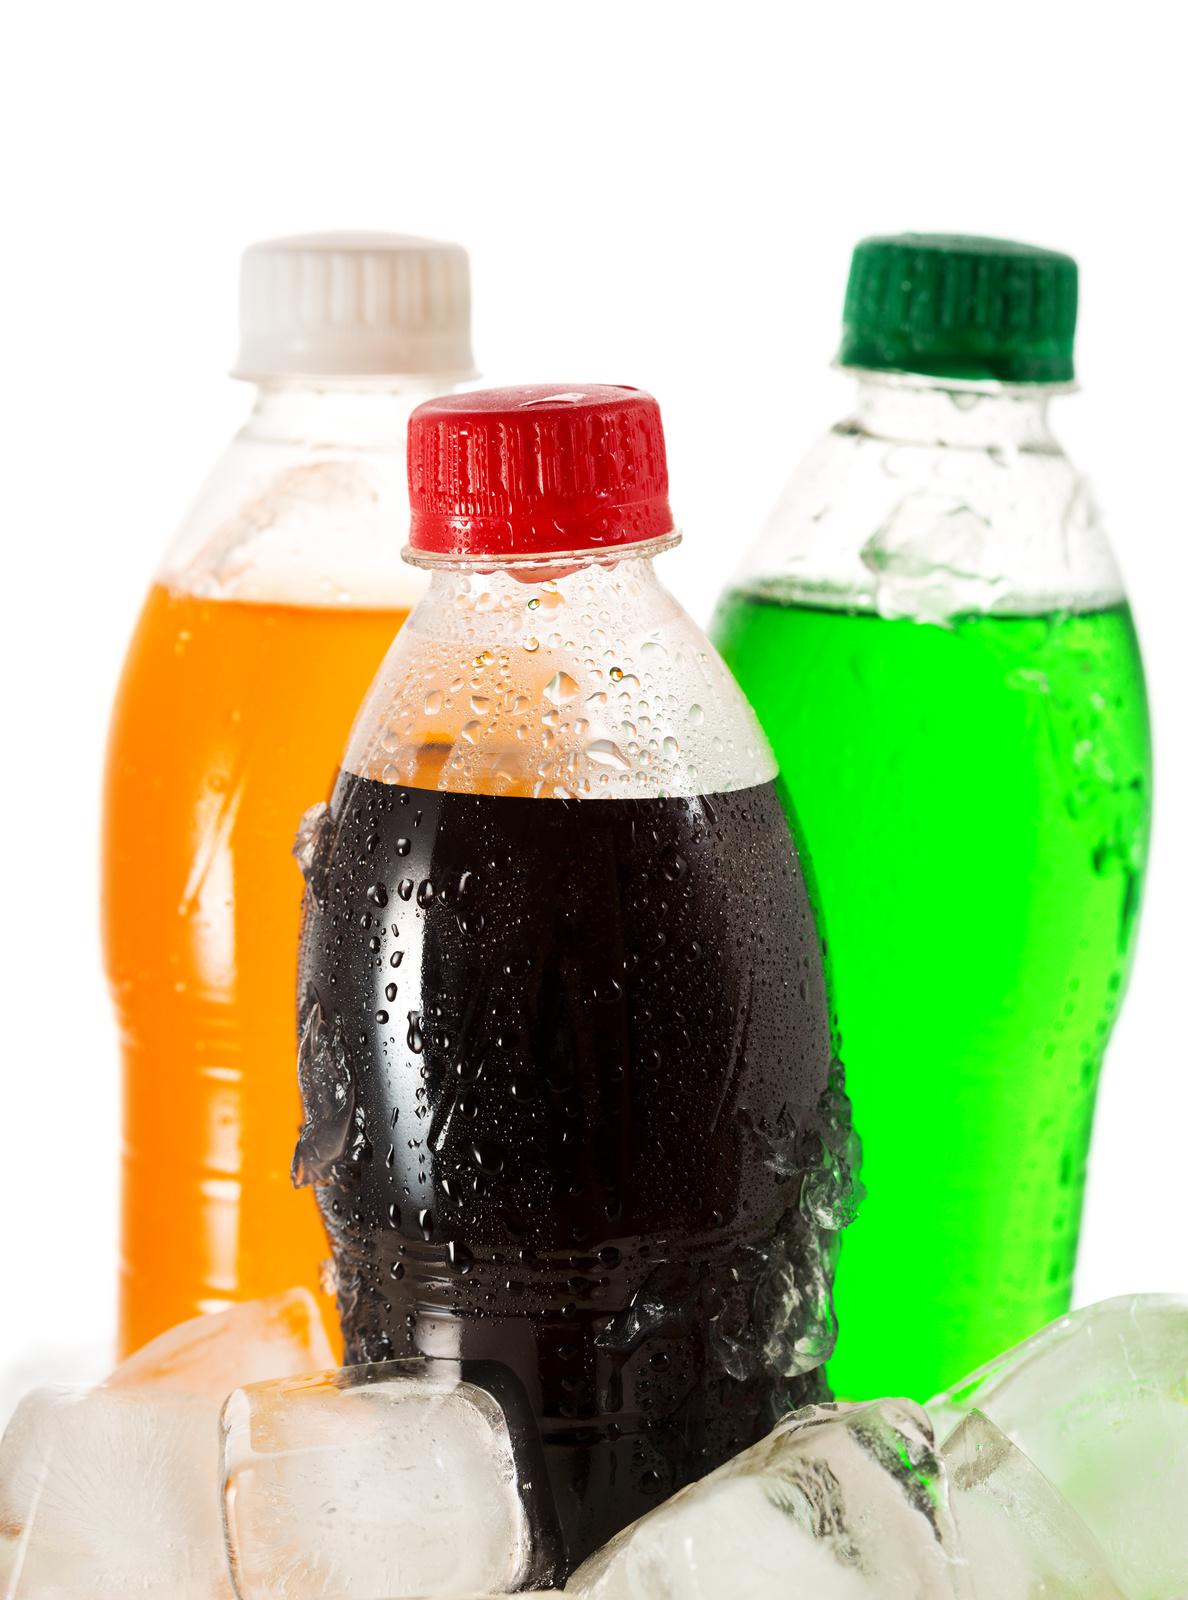 Фото напитки в бутылках